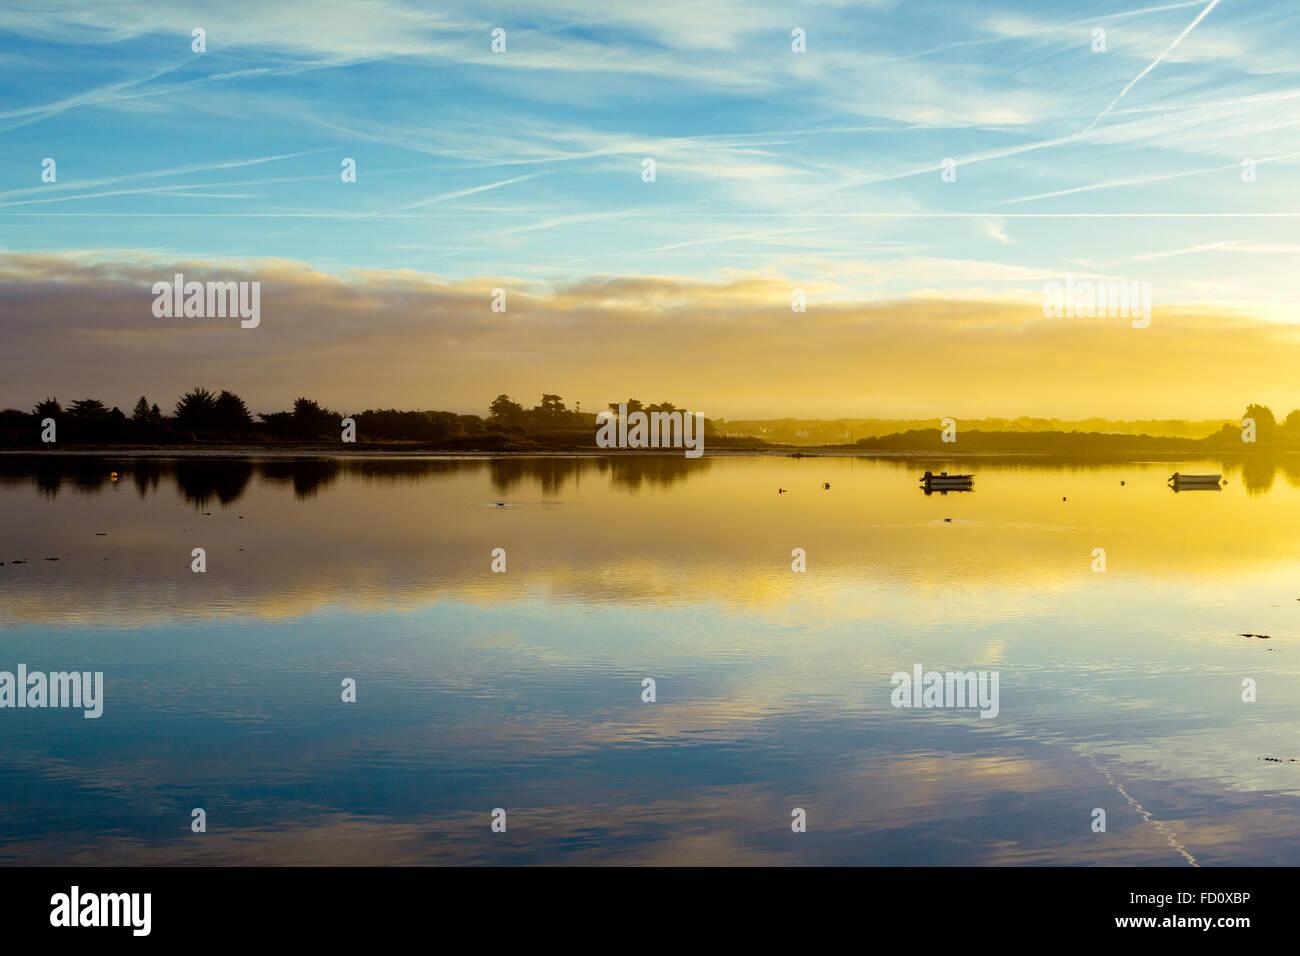 Frankreich, Bretagne, Morbihan, die Insel Saint Cado de Belz in der Ria d Etel. Stockbild